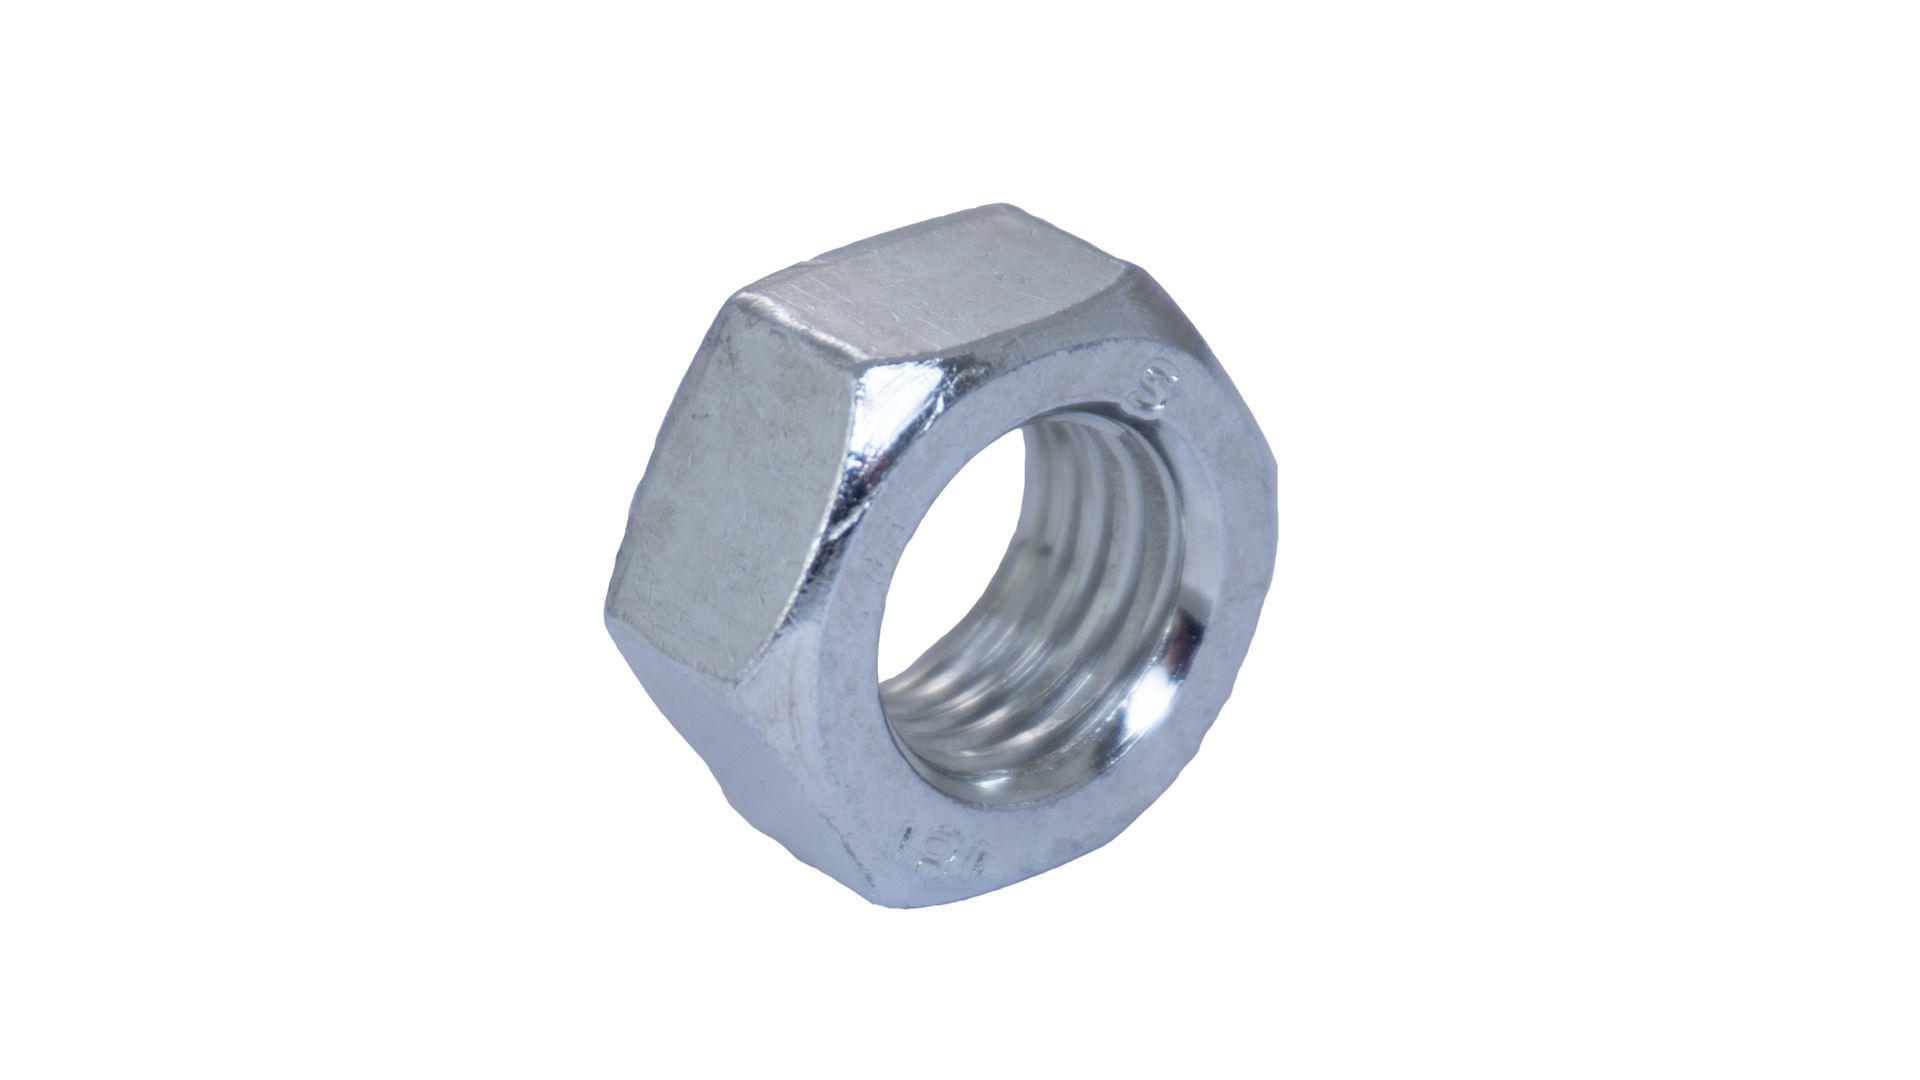 Гайка шестигранная Apro - М16 DIN 934 (20 шт.) 3